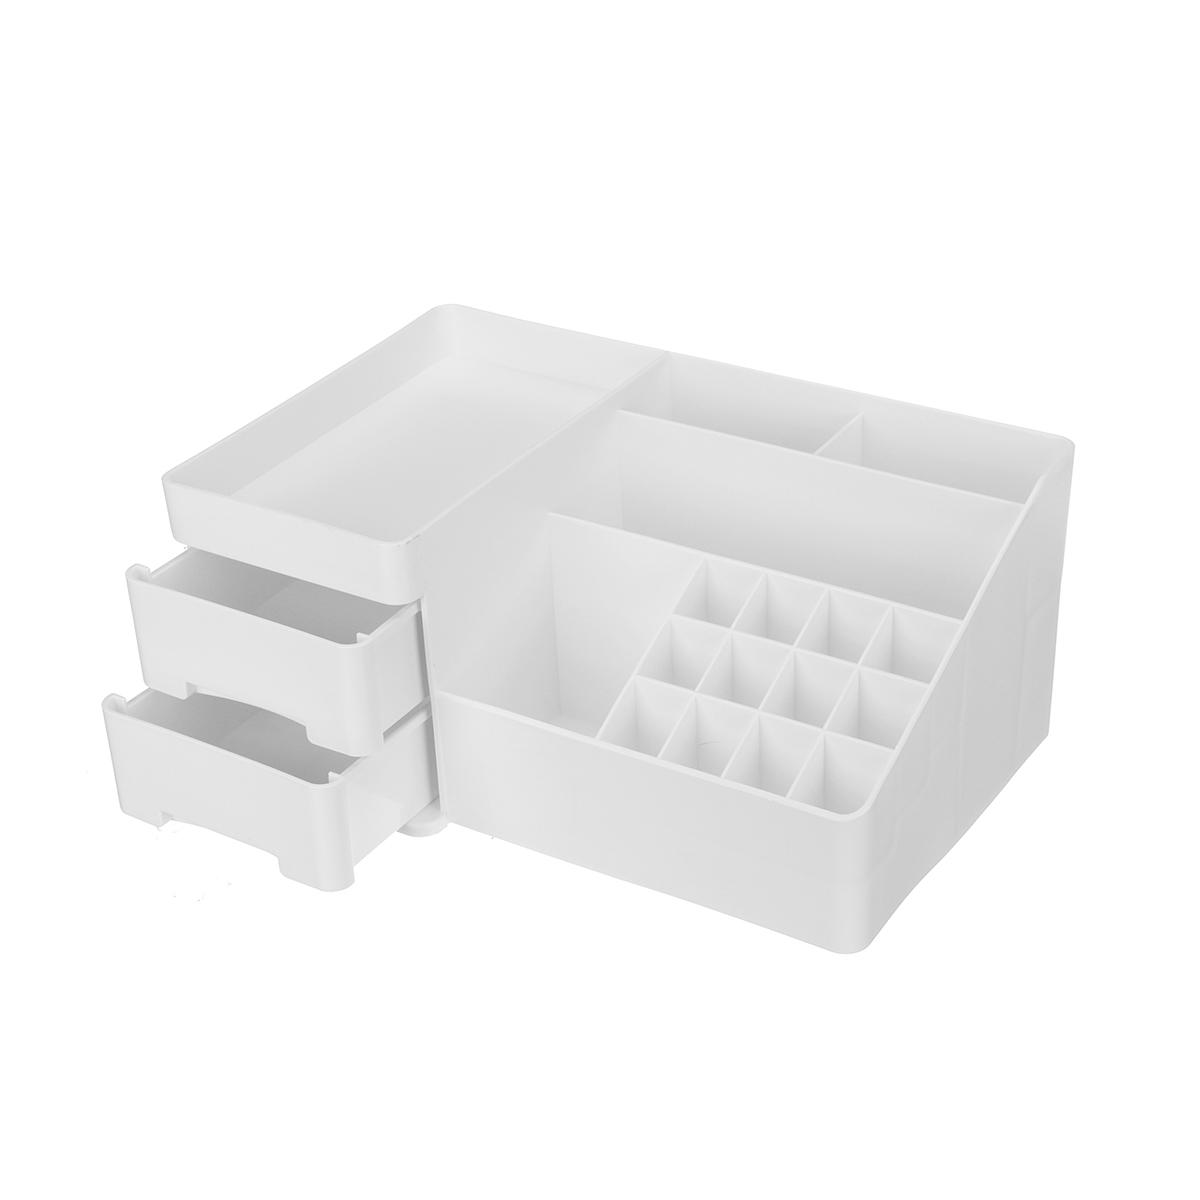 Desktop Cosmetic Storage Box Drawer Type Makeup Sundries Stationery Organizer Jewelry Display Case Box